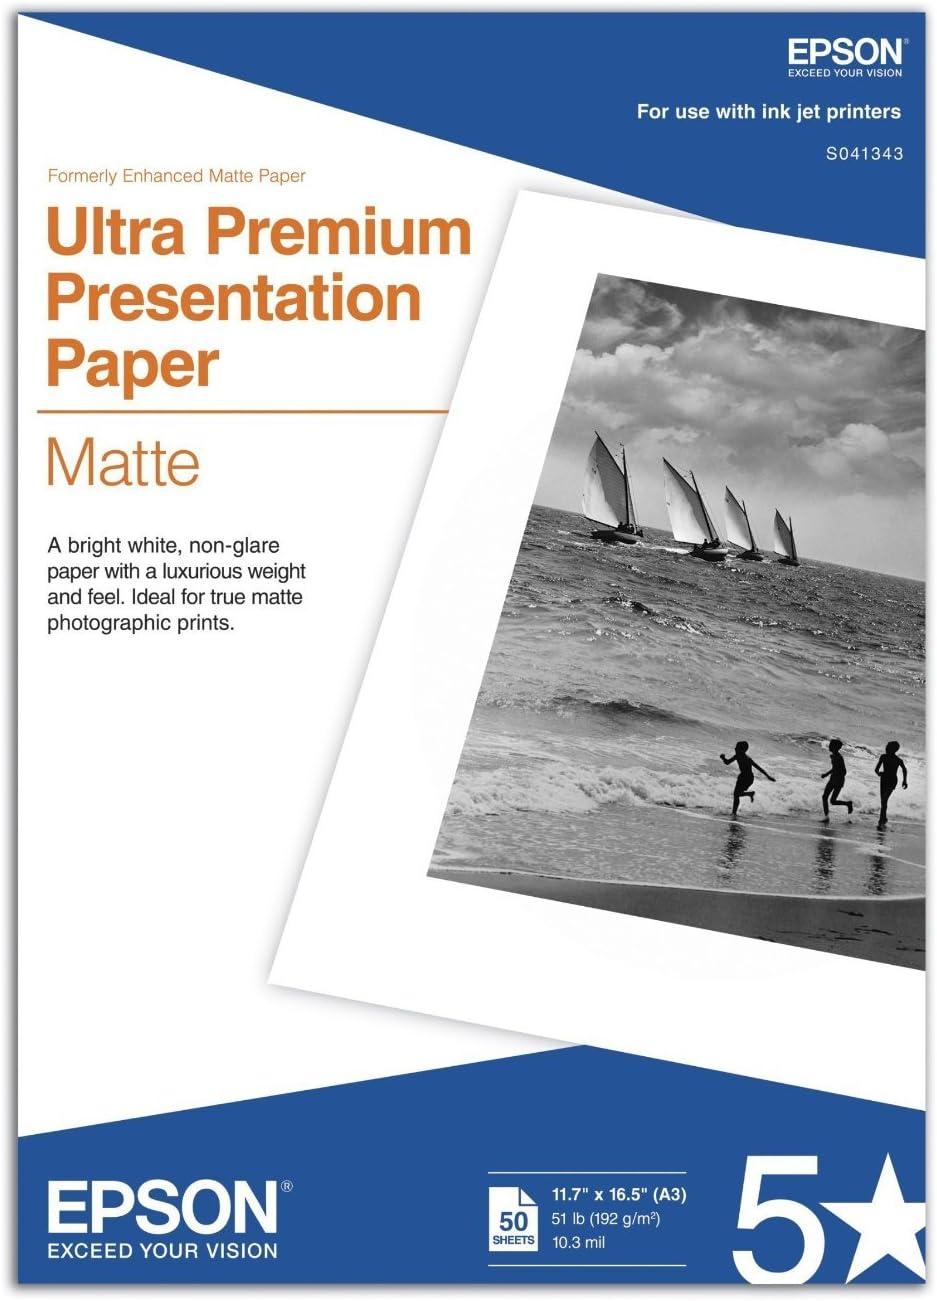 11.7x16.5 Inches 50 Sheets S041260 Epson Premium Presentation Paper MATTE